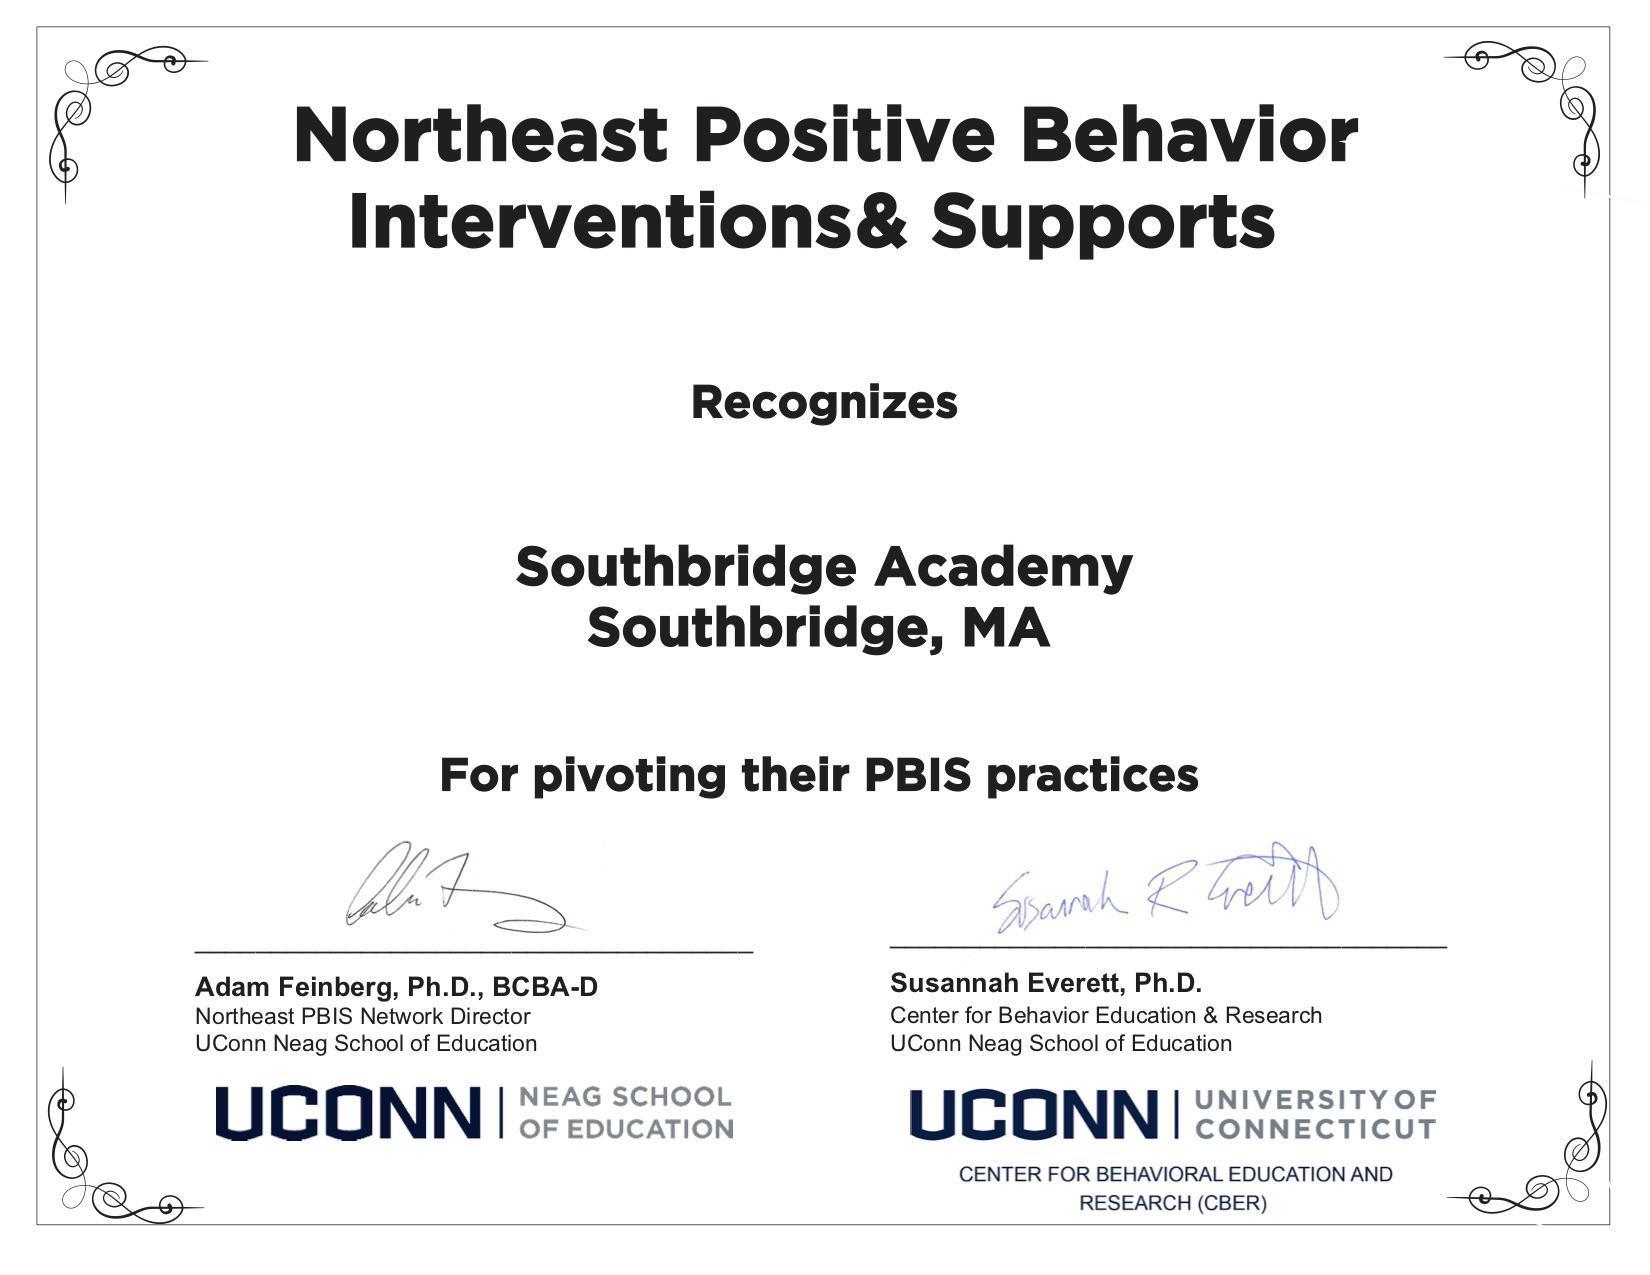 Certificate recognizing PBIS achievement at Southbridge Academy